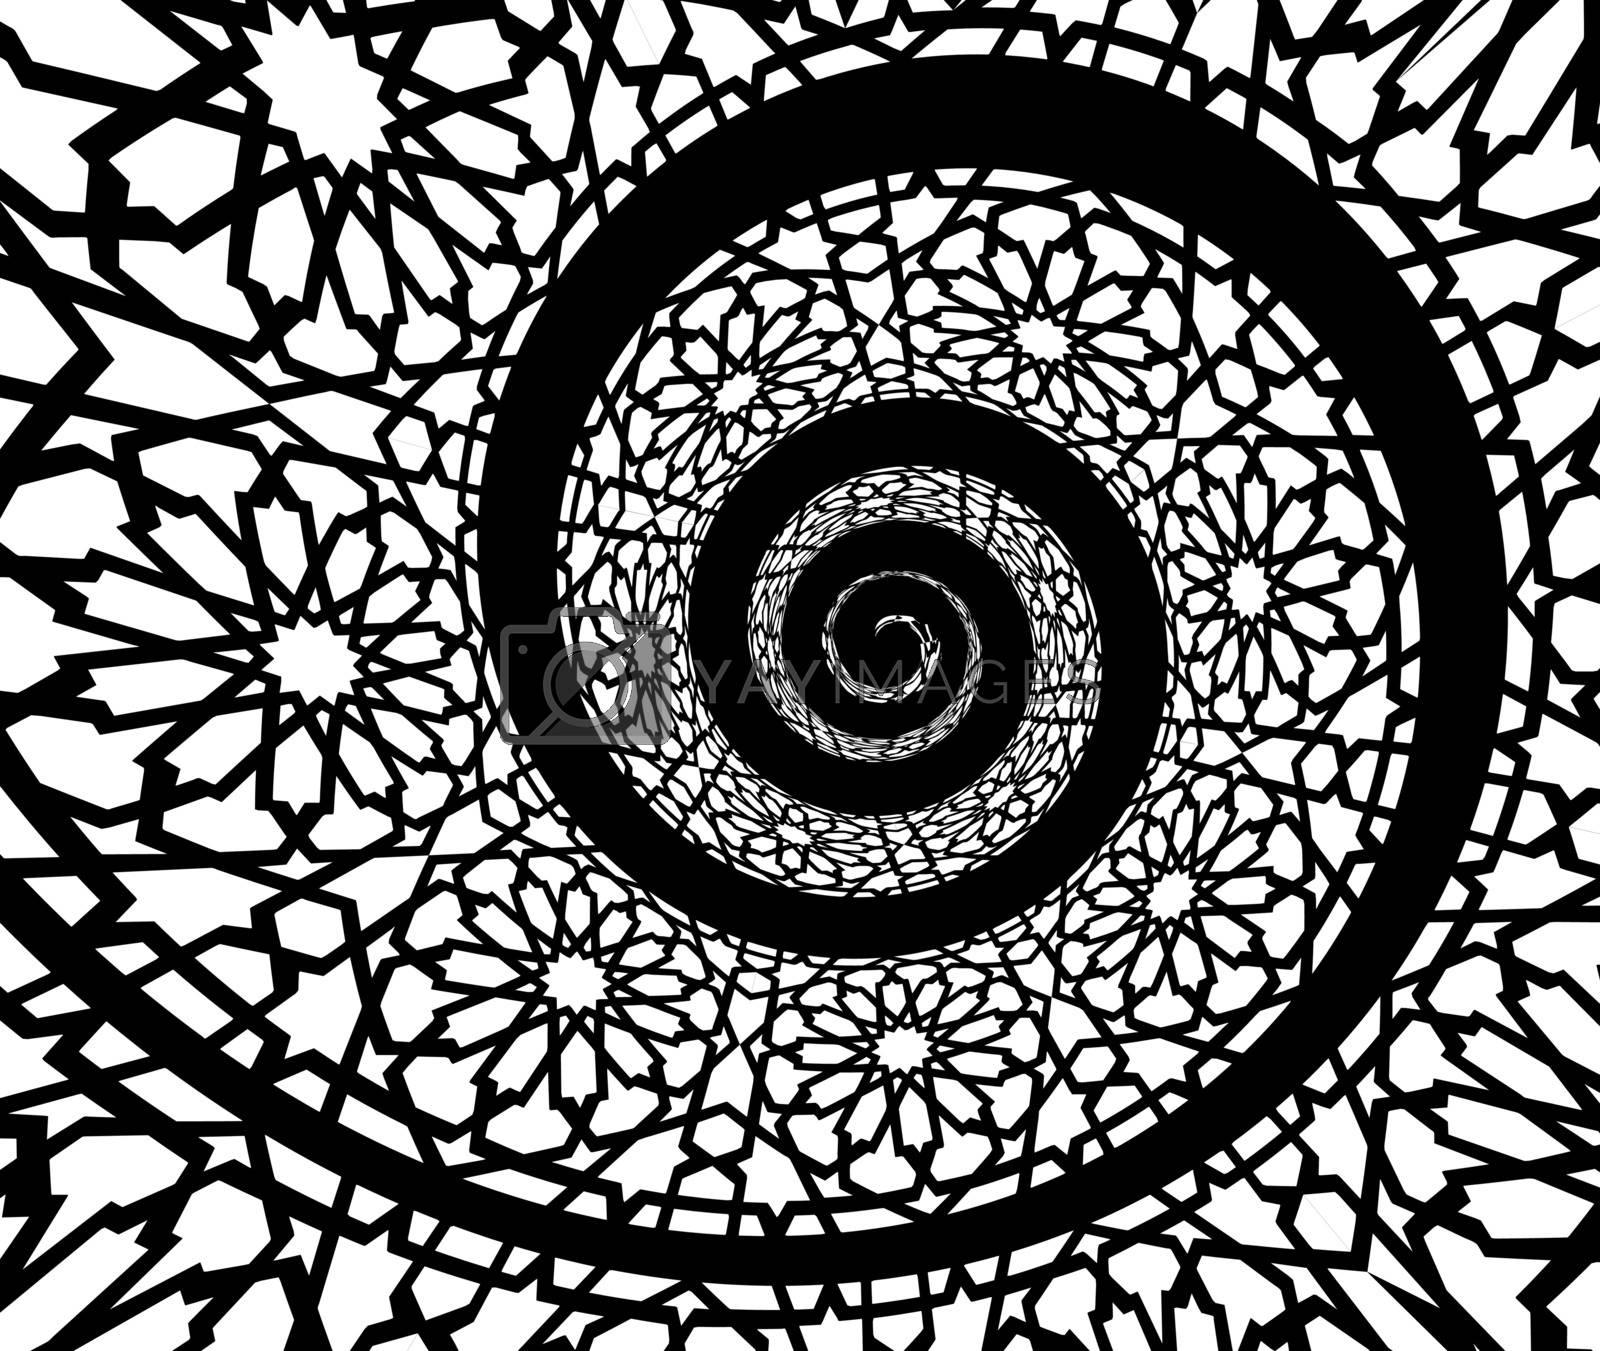 Islamic pattern, swirled in 3d spiral shape. Vector illustration